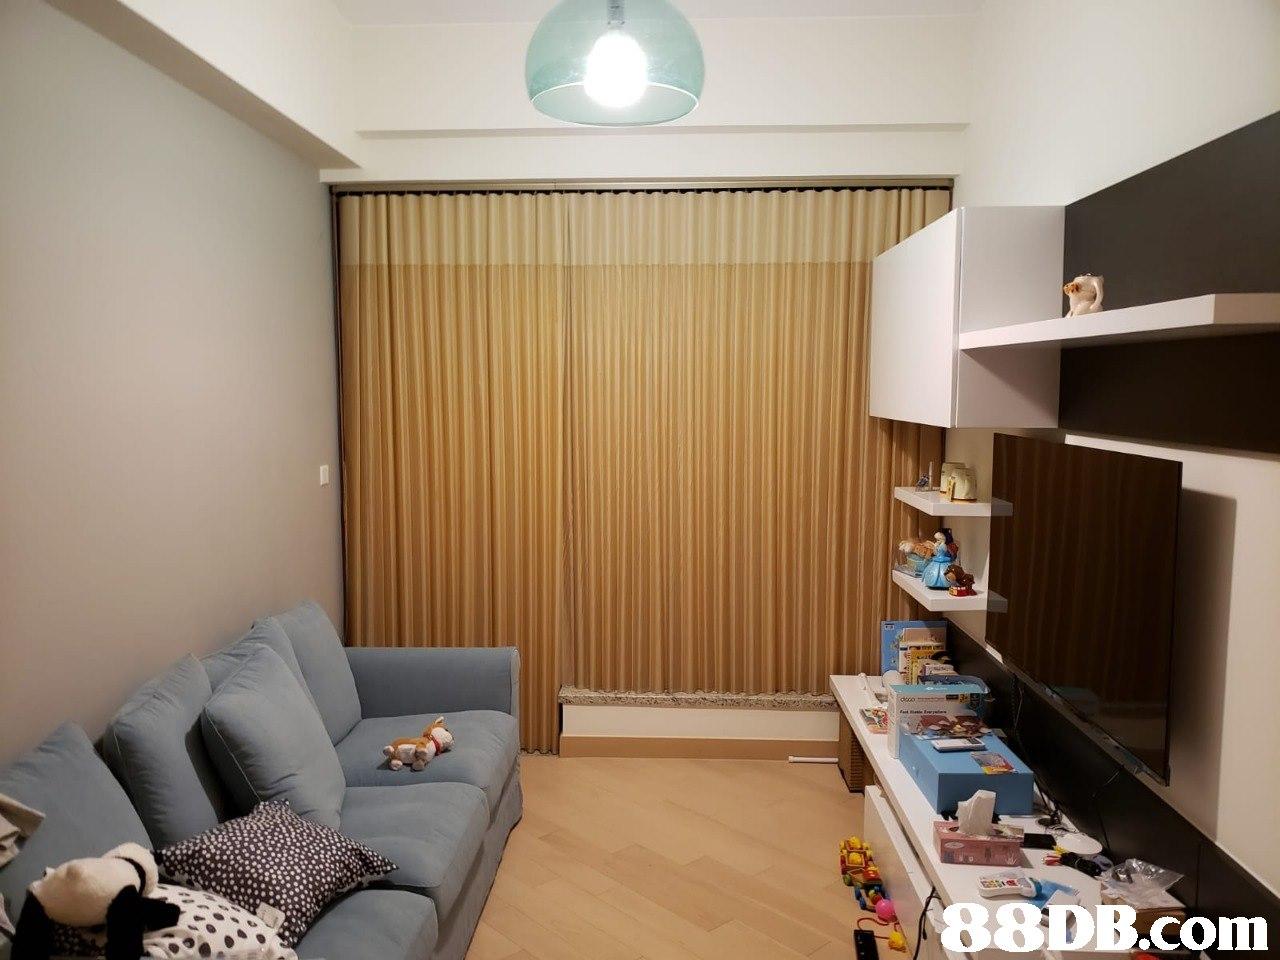 Room,Interior design,Property,Furniture,Ceiling